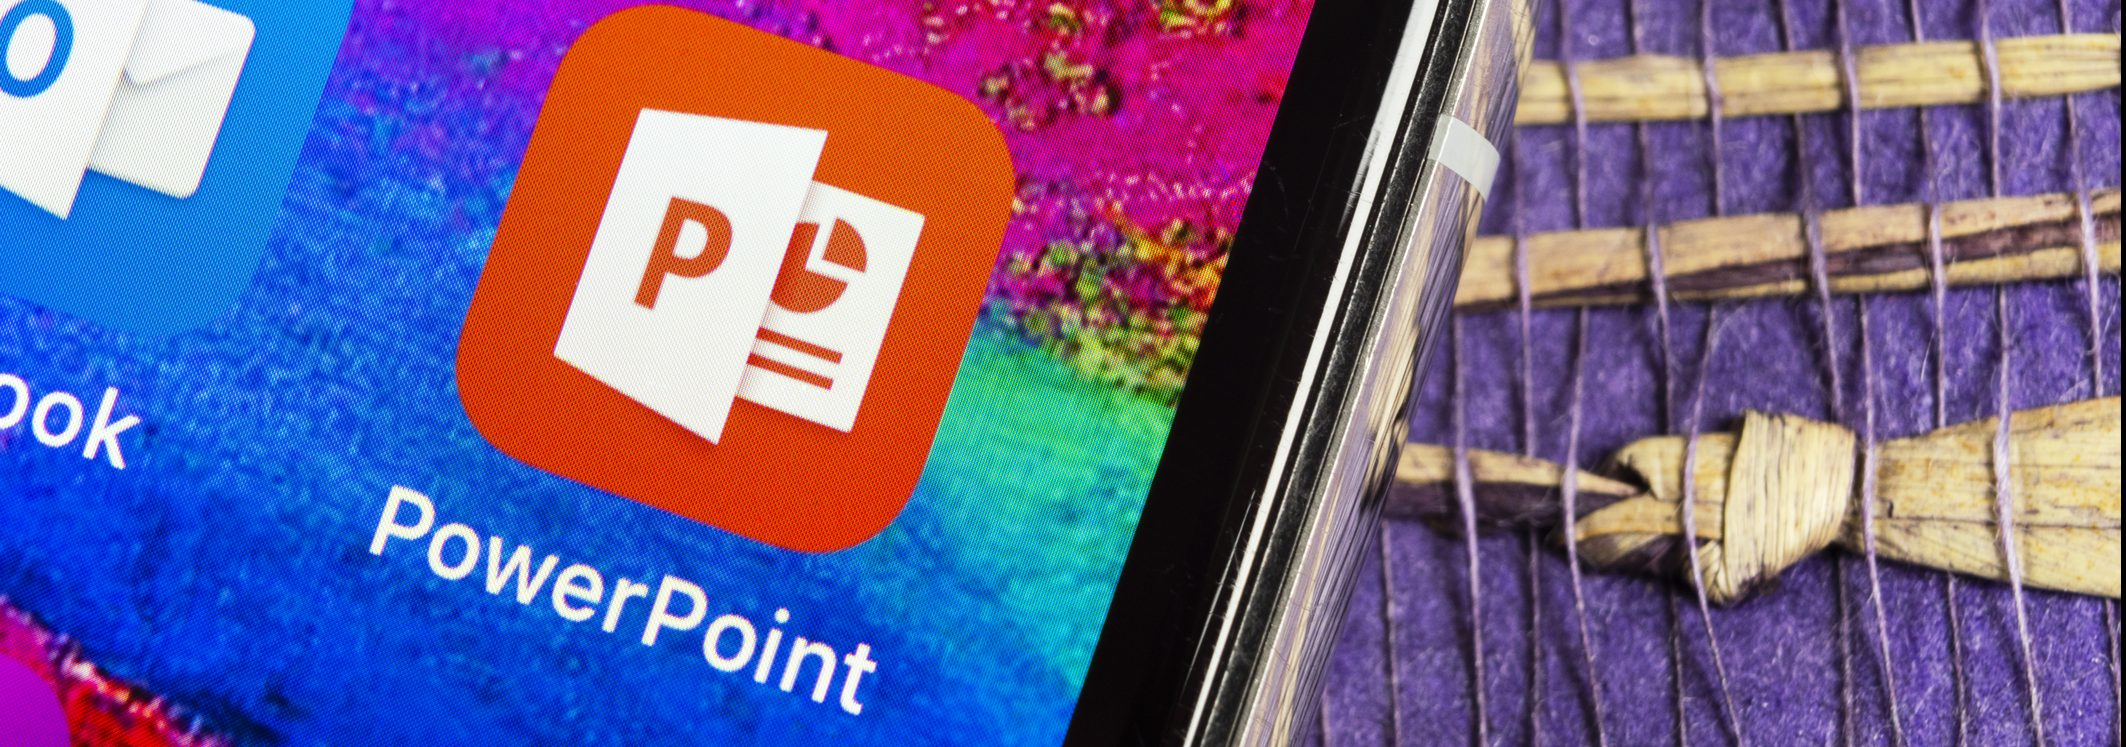 Microsoft PowerPoint advanced training